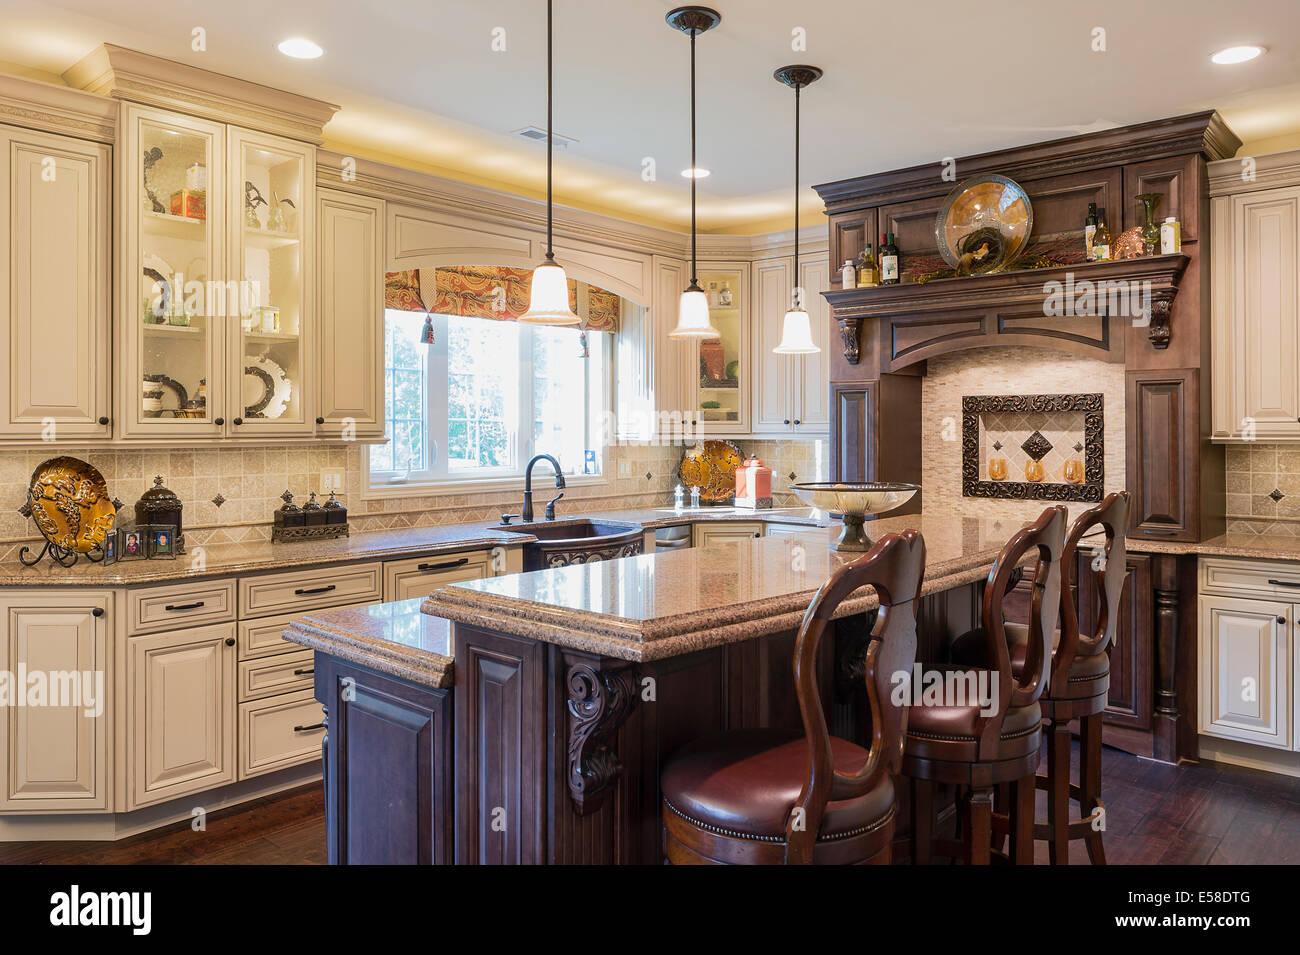 Upscale kitchen interior design. - Stock Image